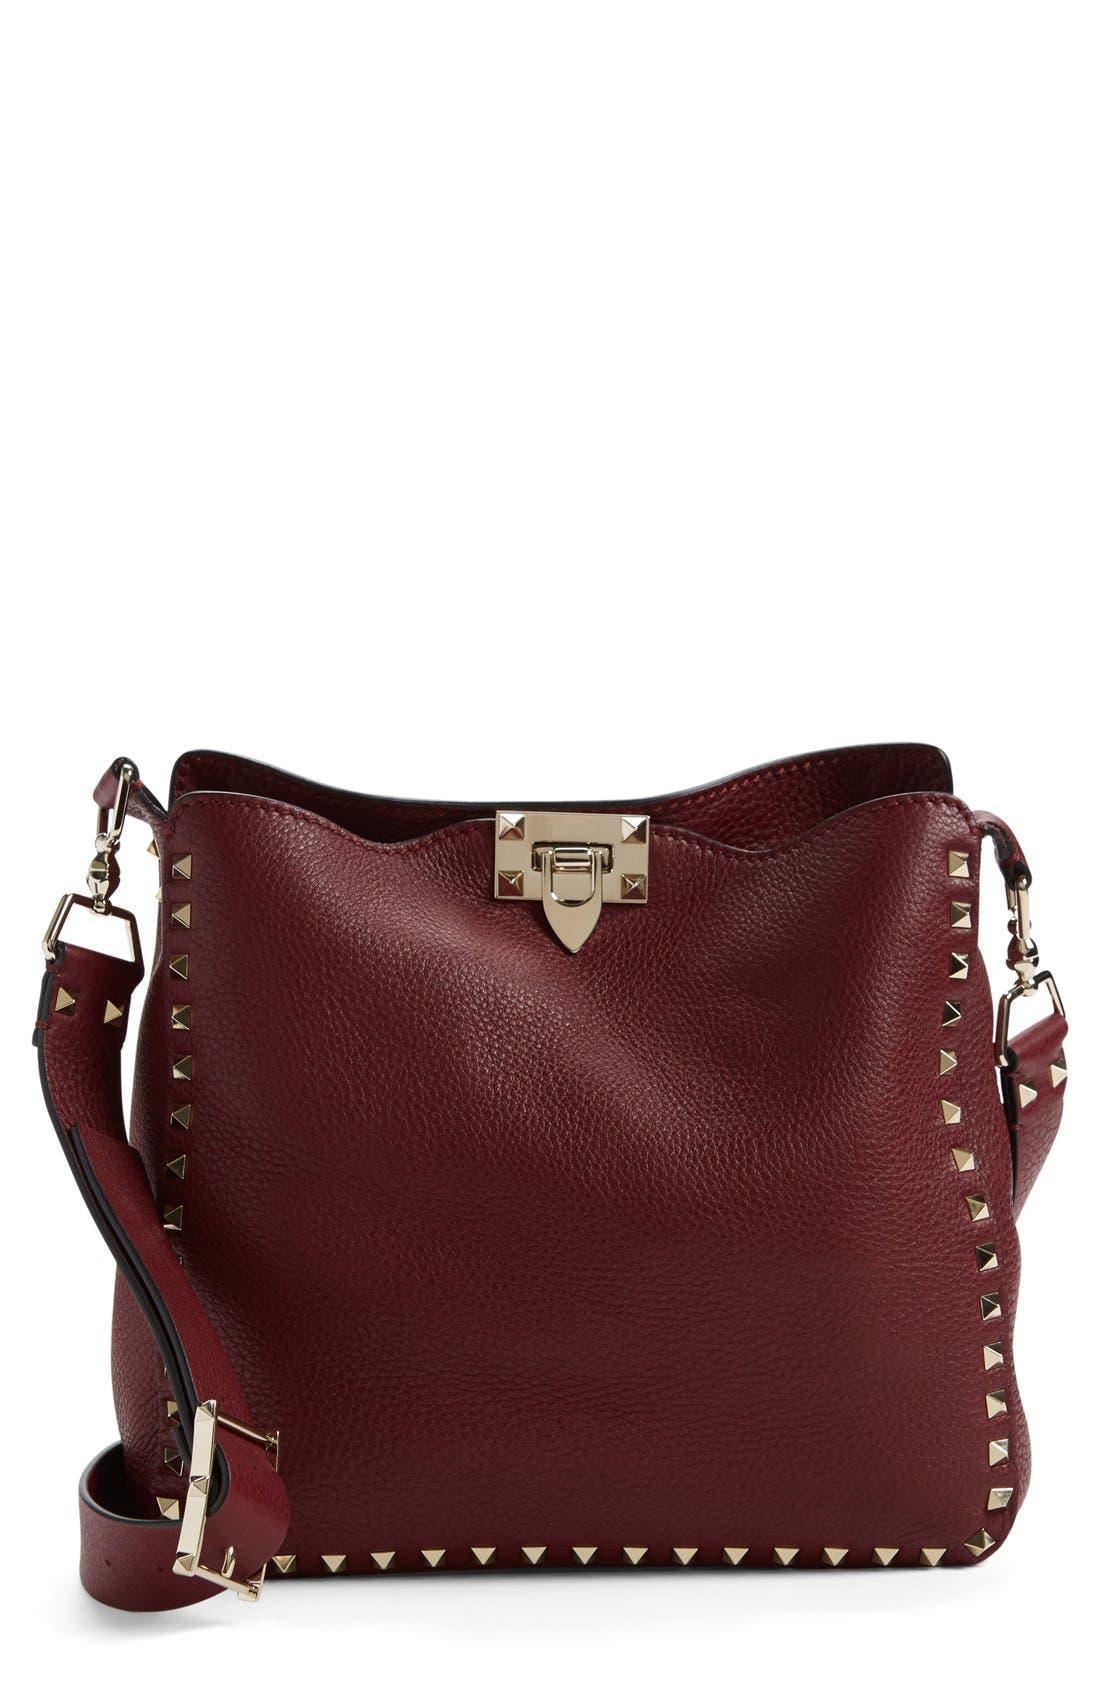 Main Image - Valentino 'Small Rockstud' Leather Hobo Bag